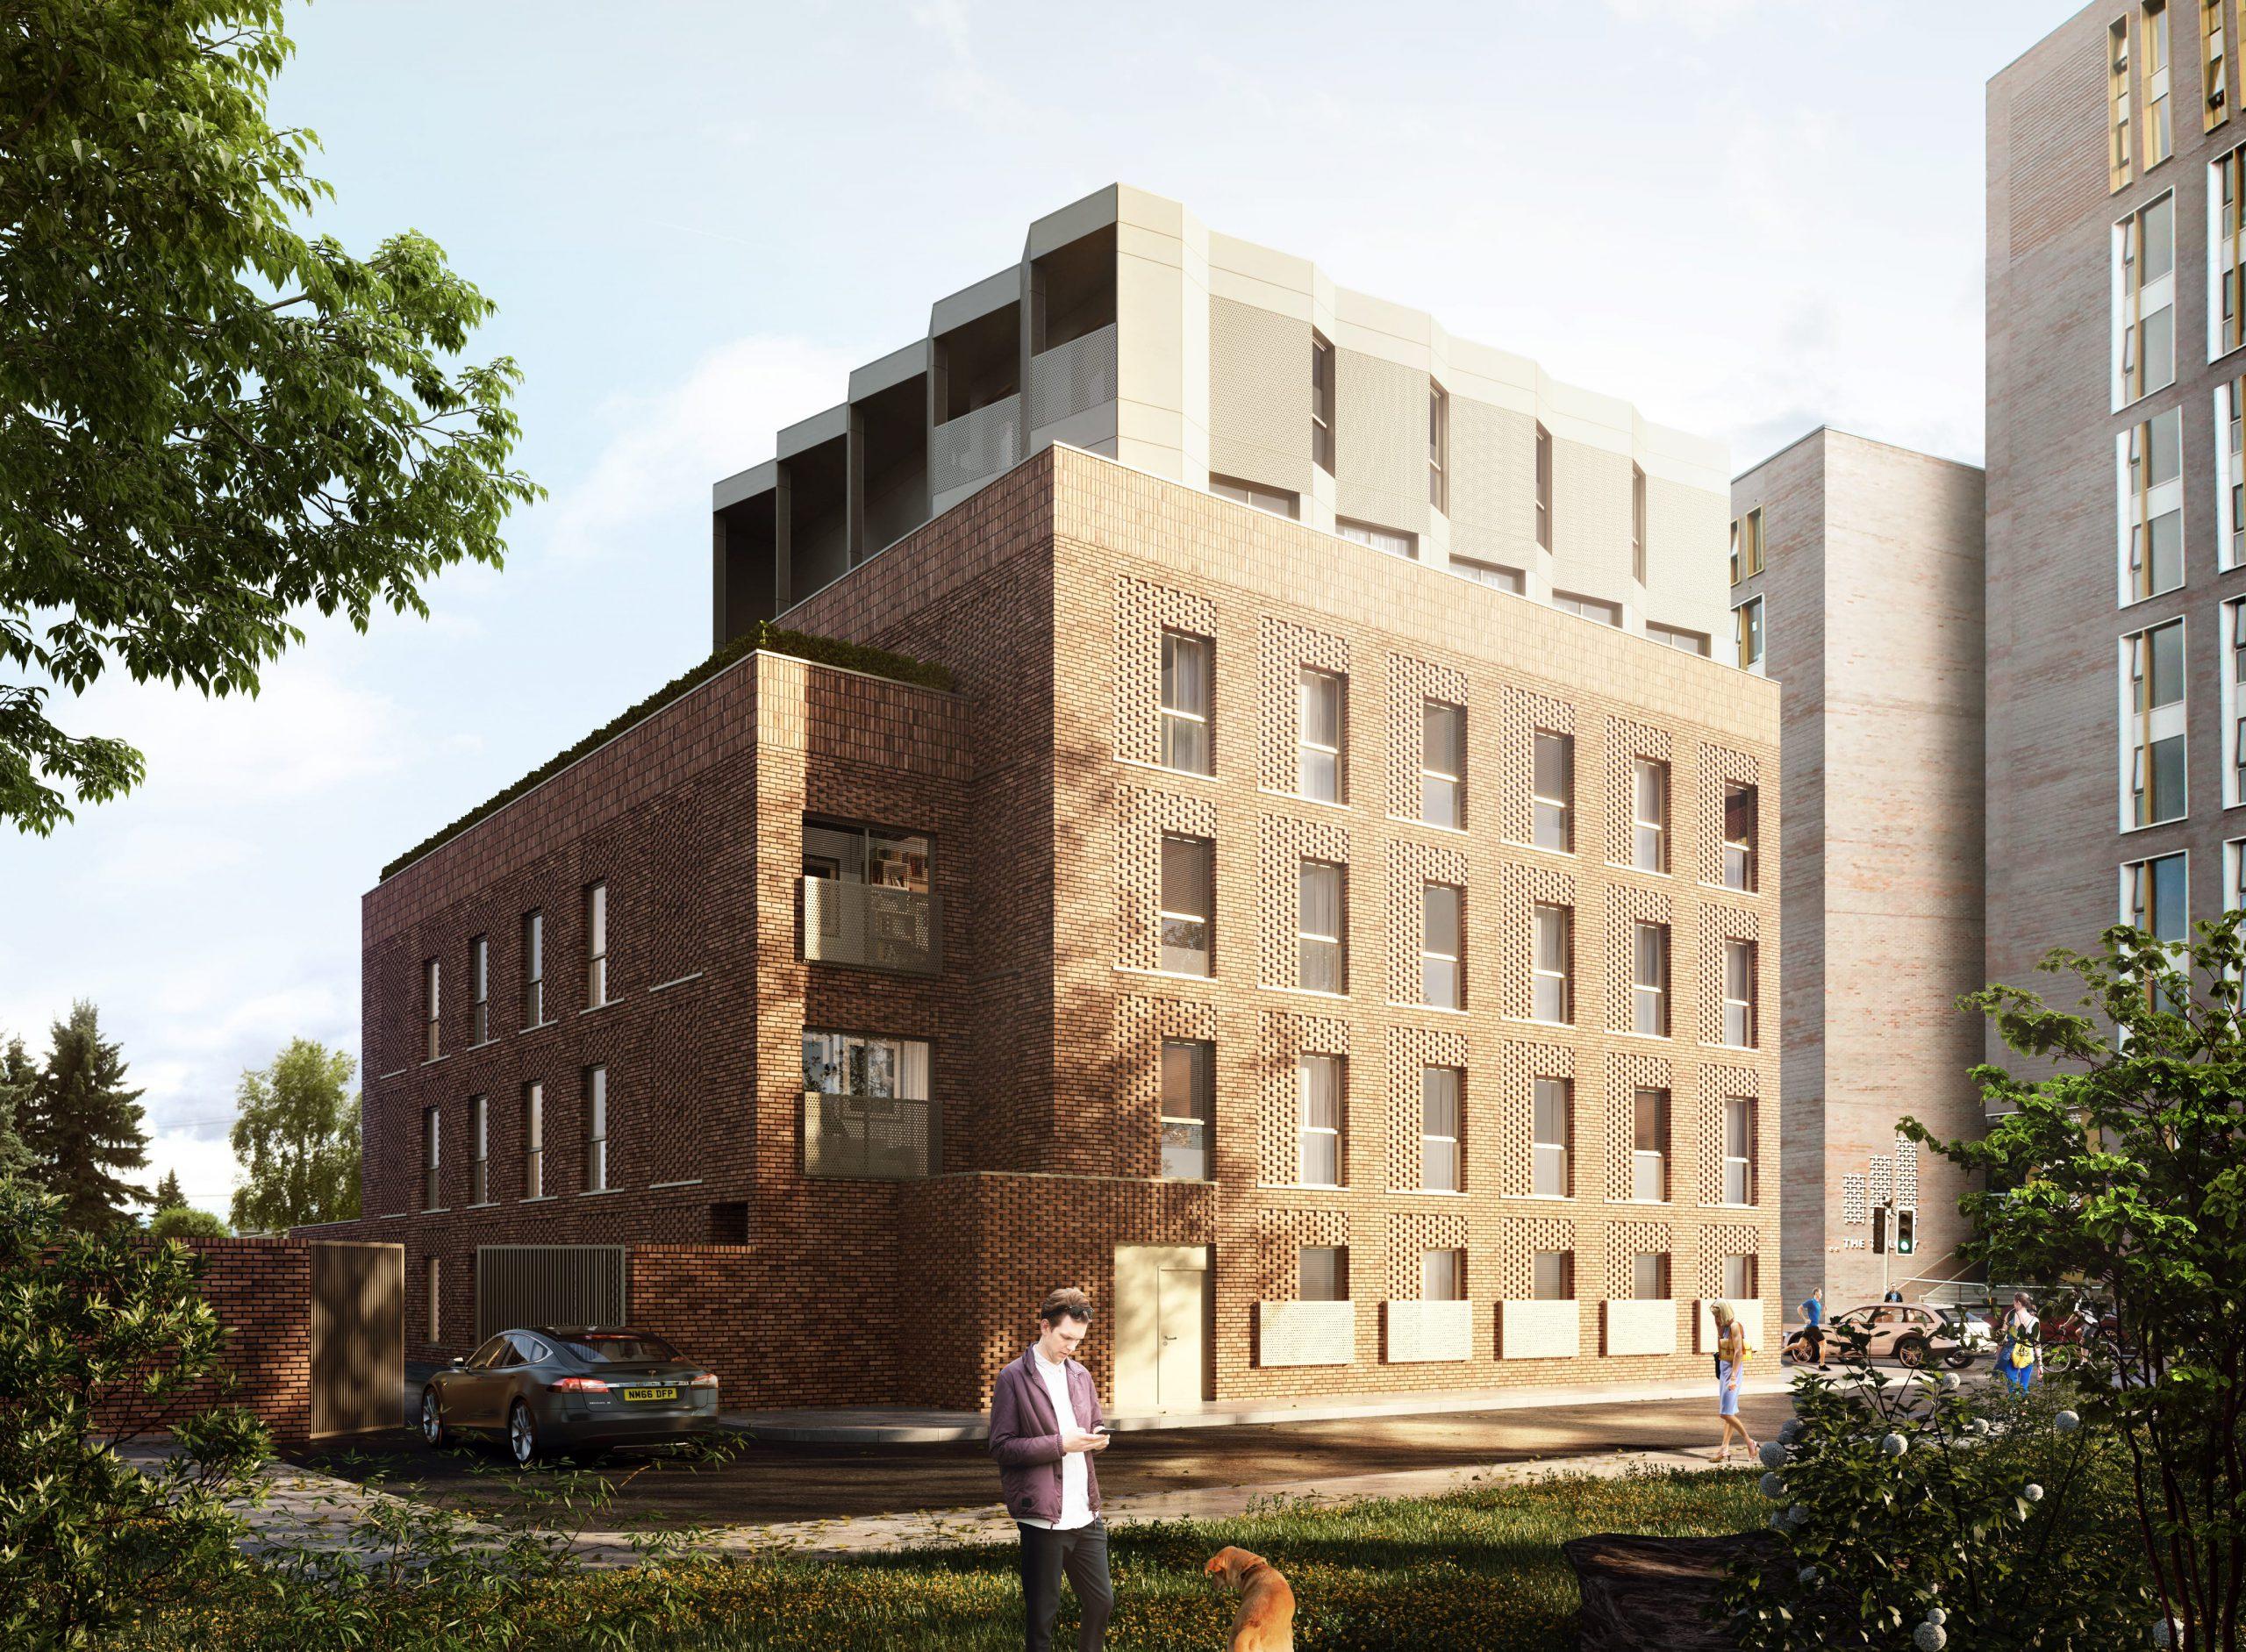 Generation CO manchester property development - architectural visualisation 1